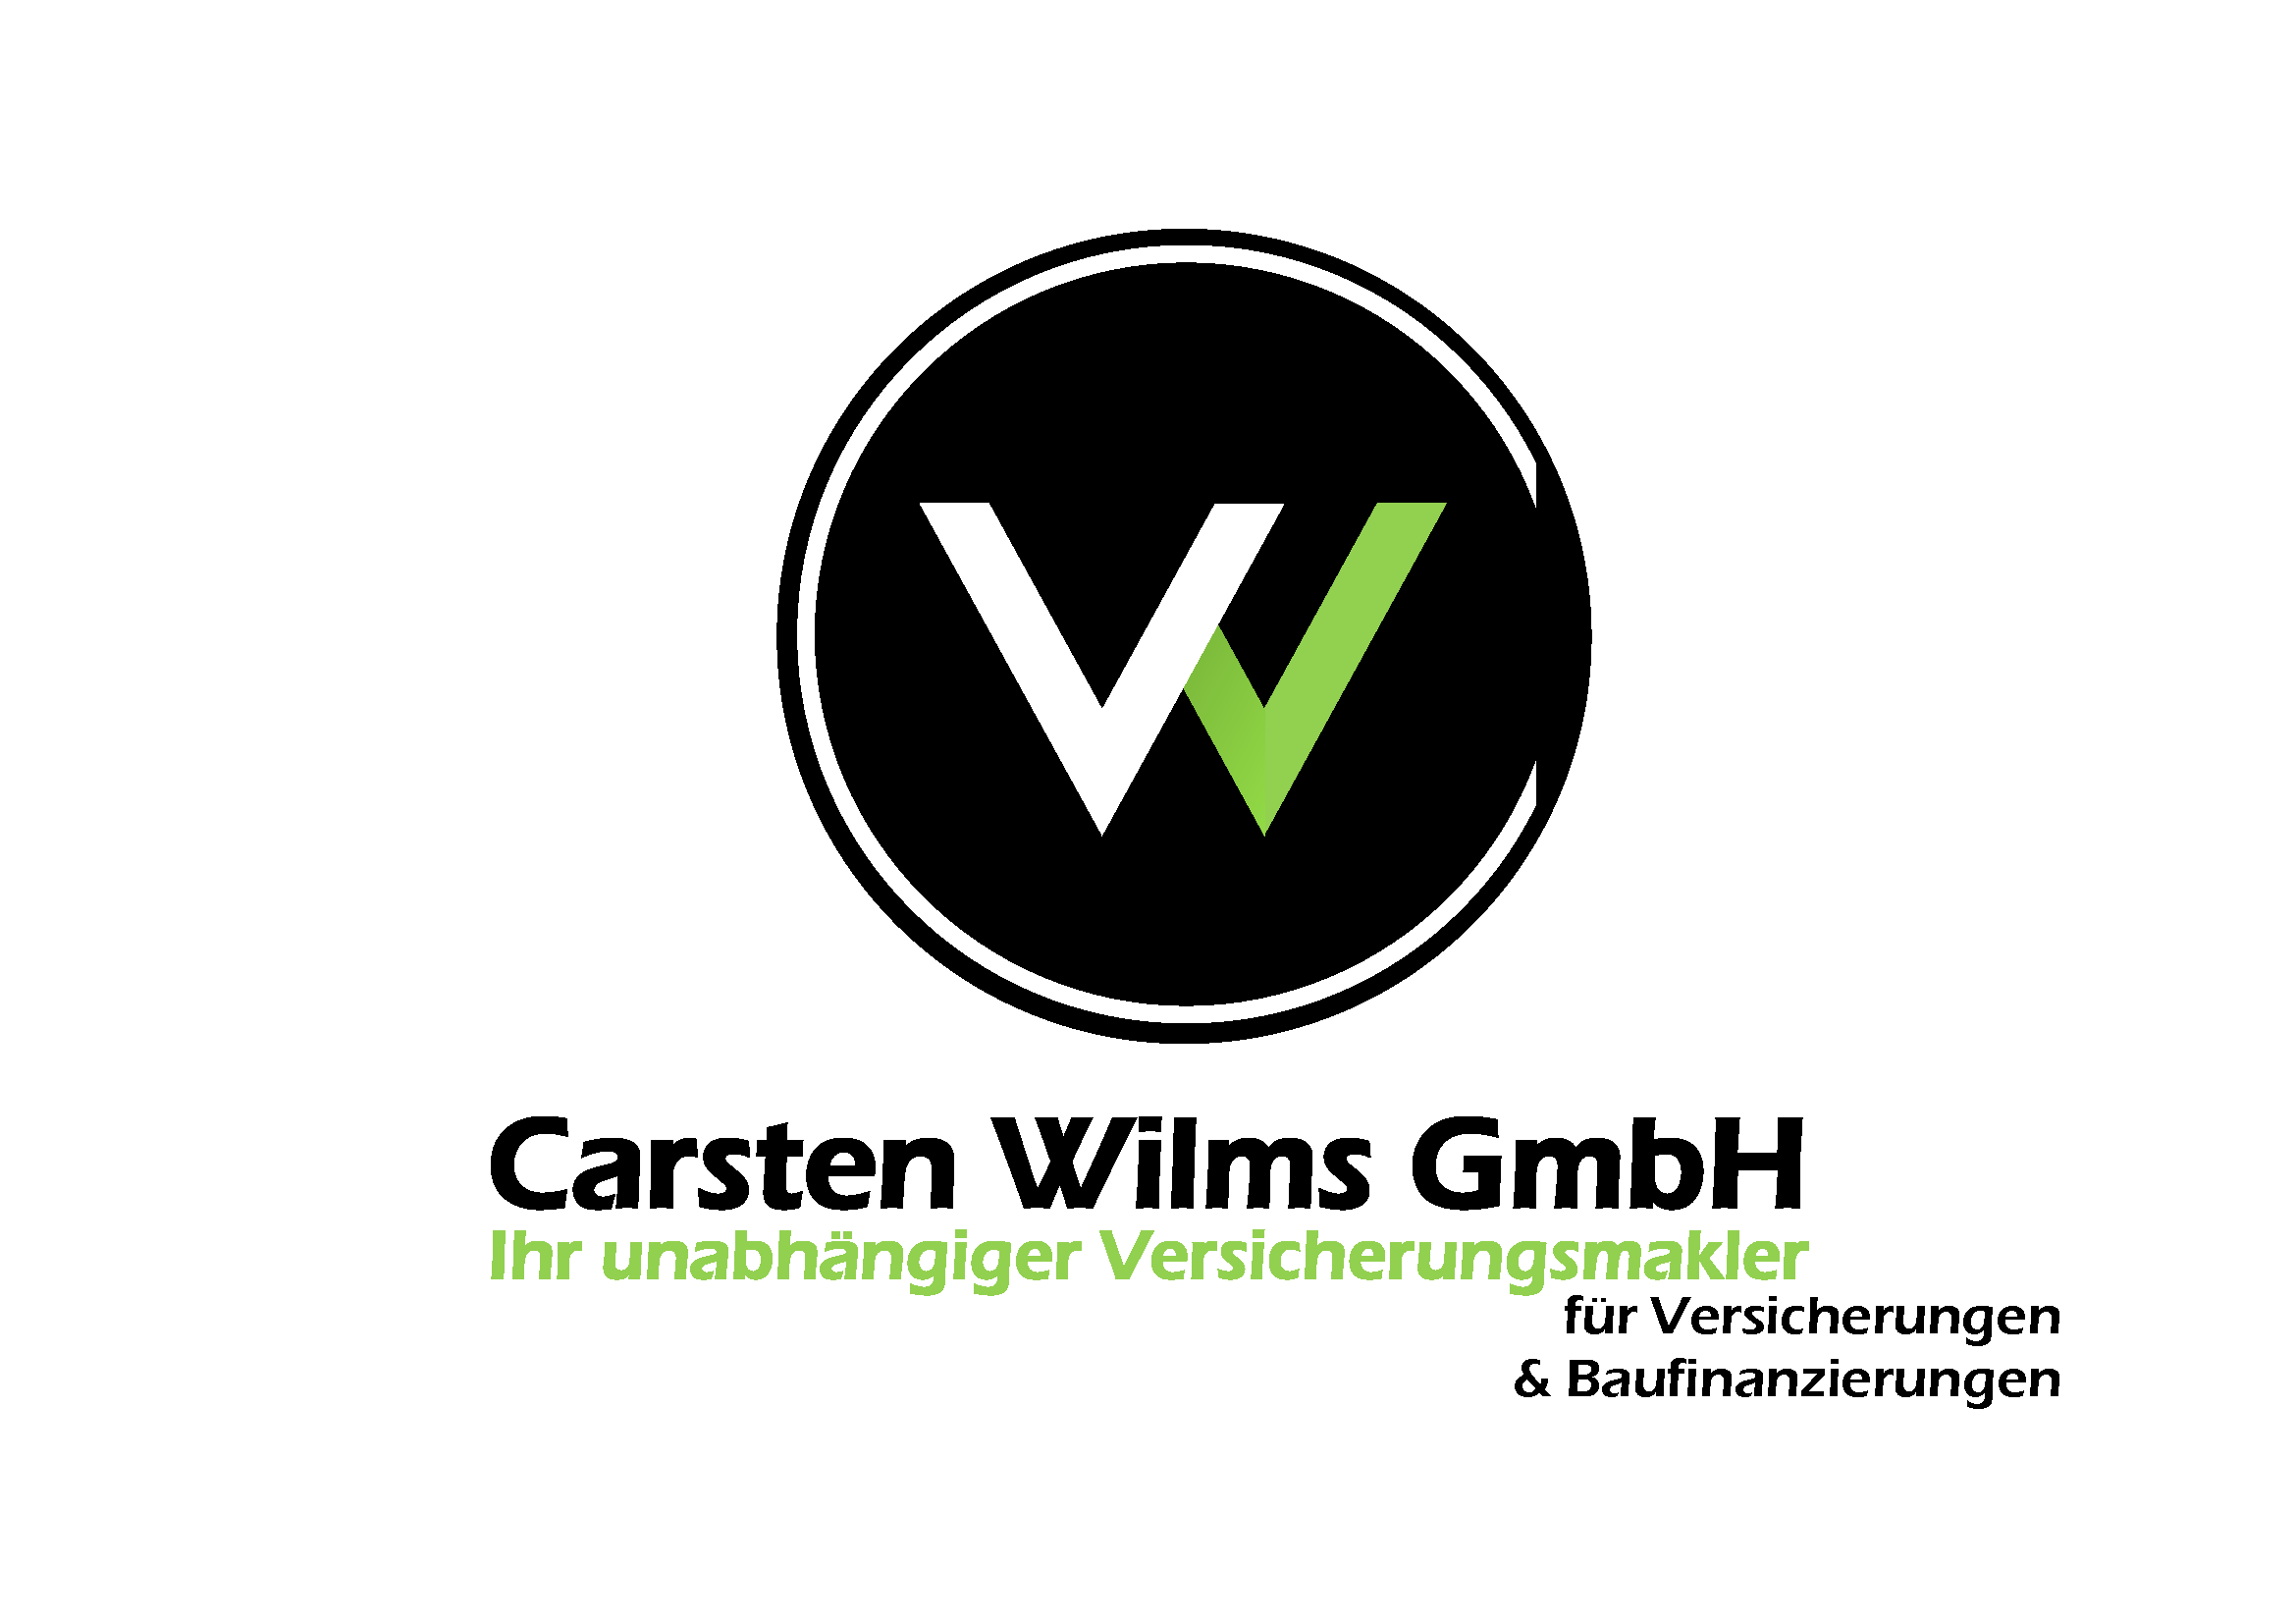 Carsten Wilms GmbH